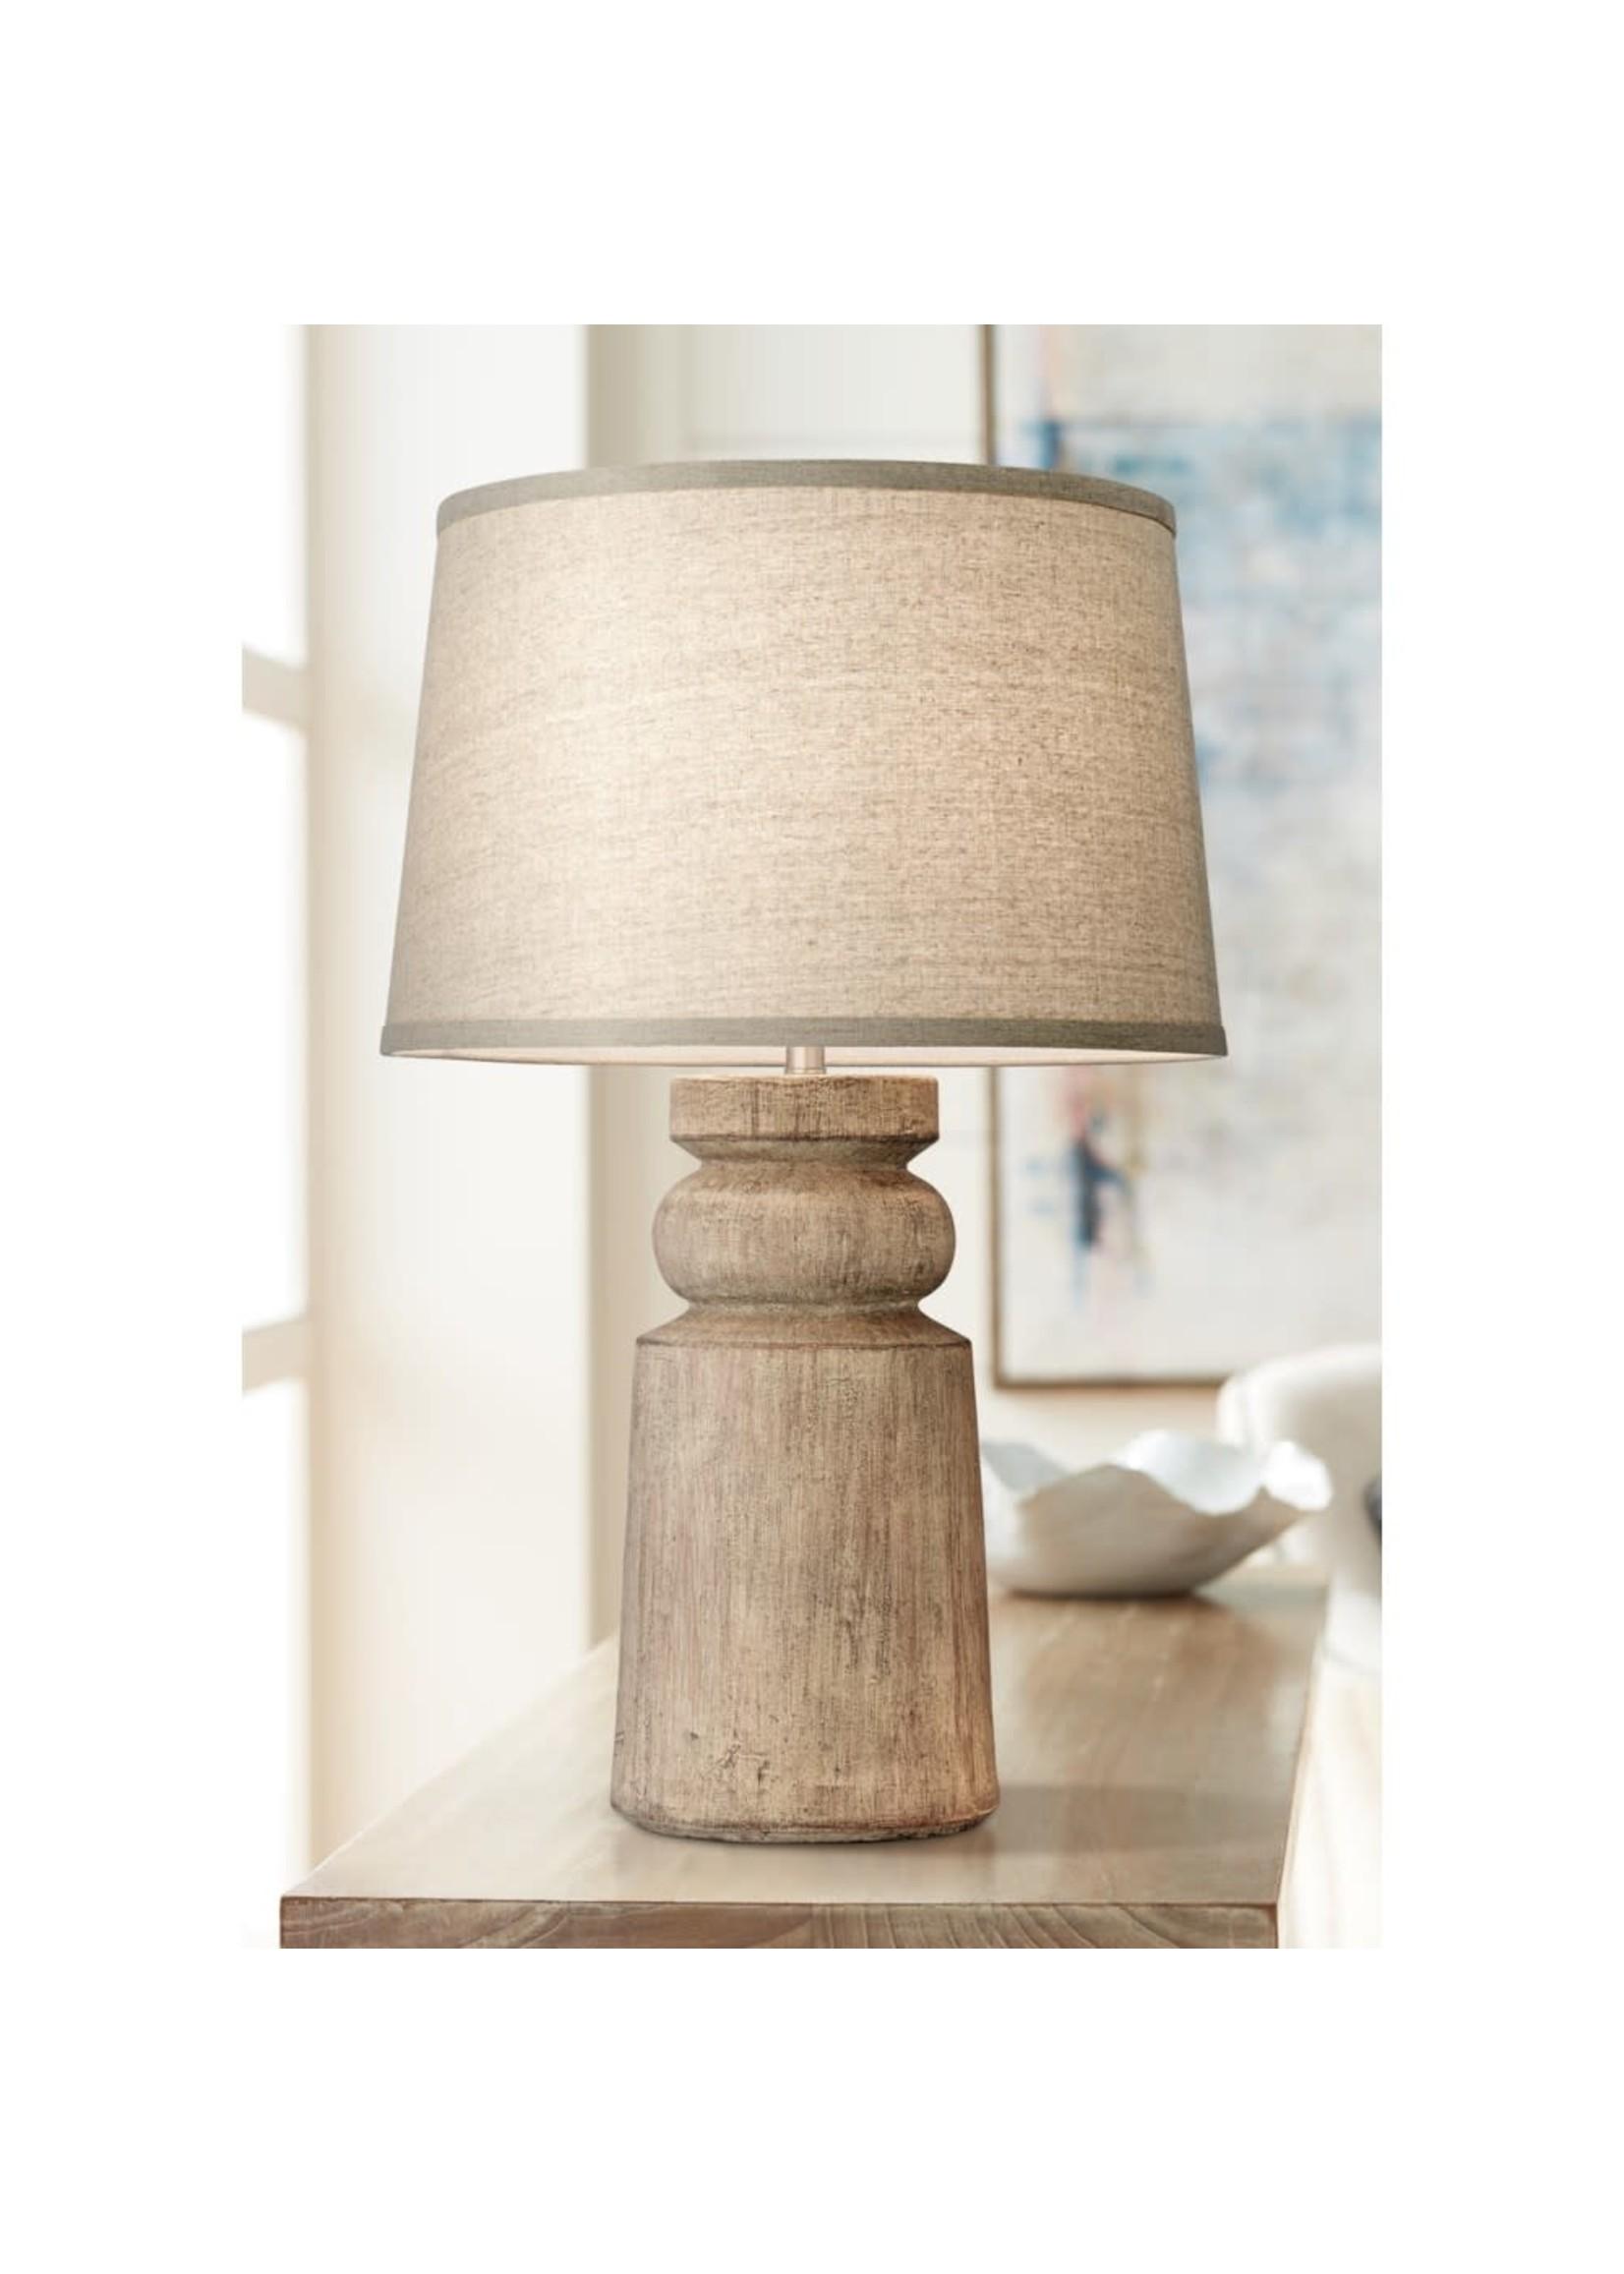 TOTEM TABLE LAMP